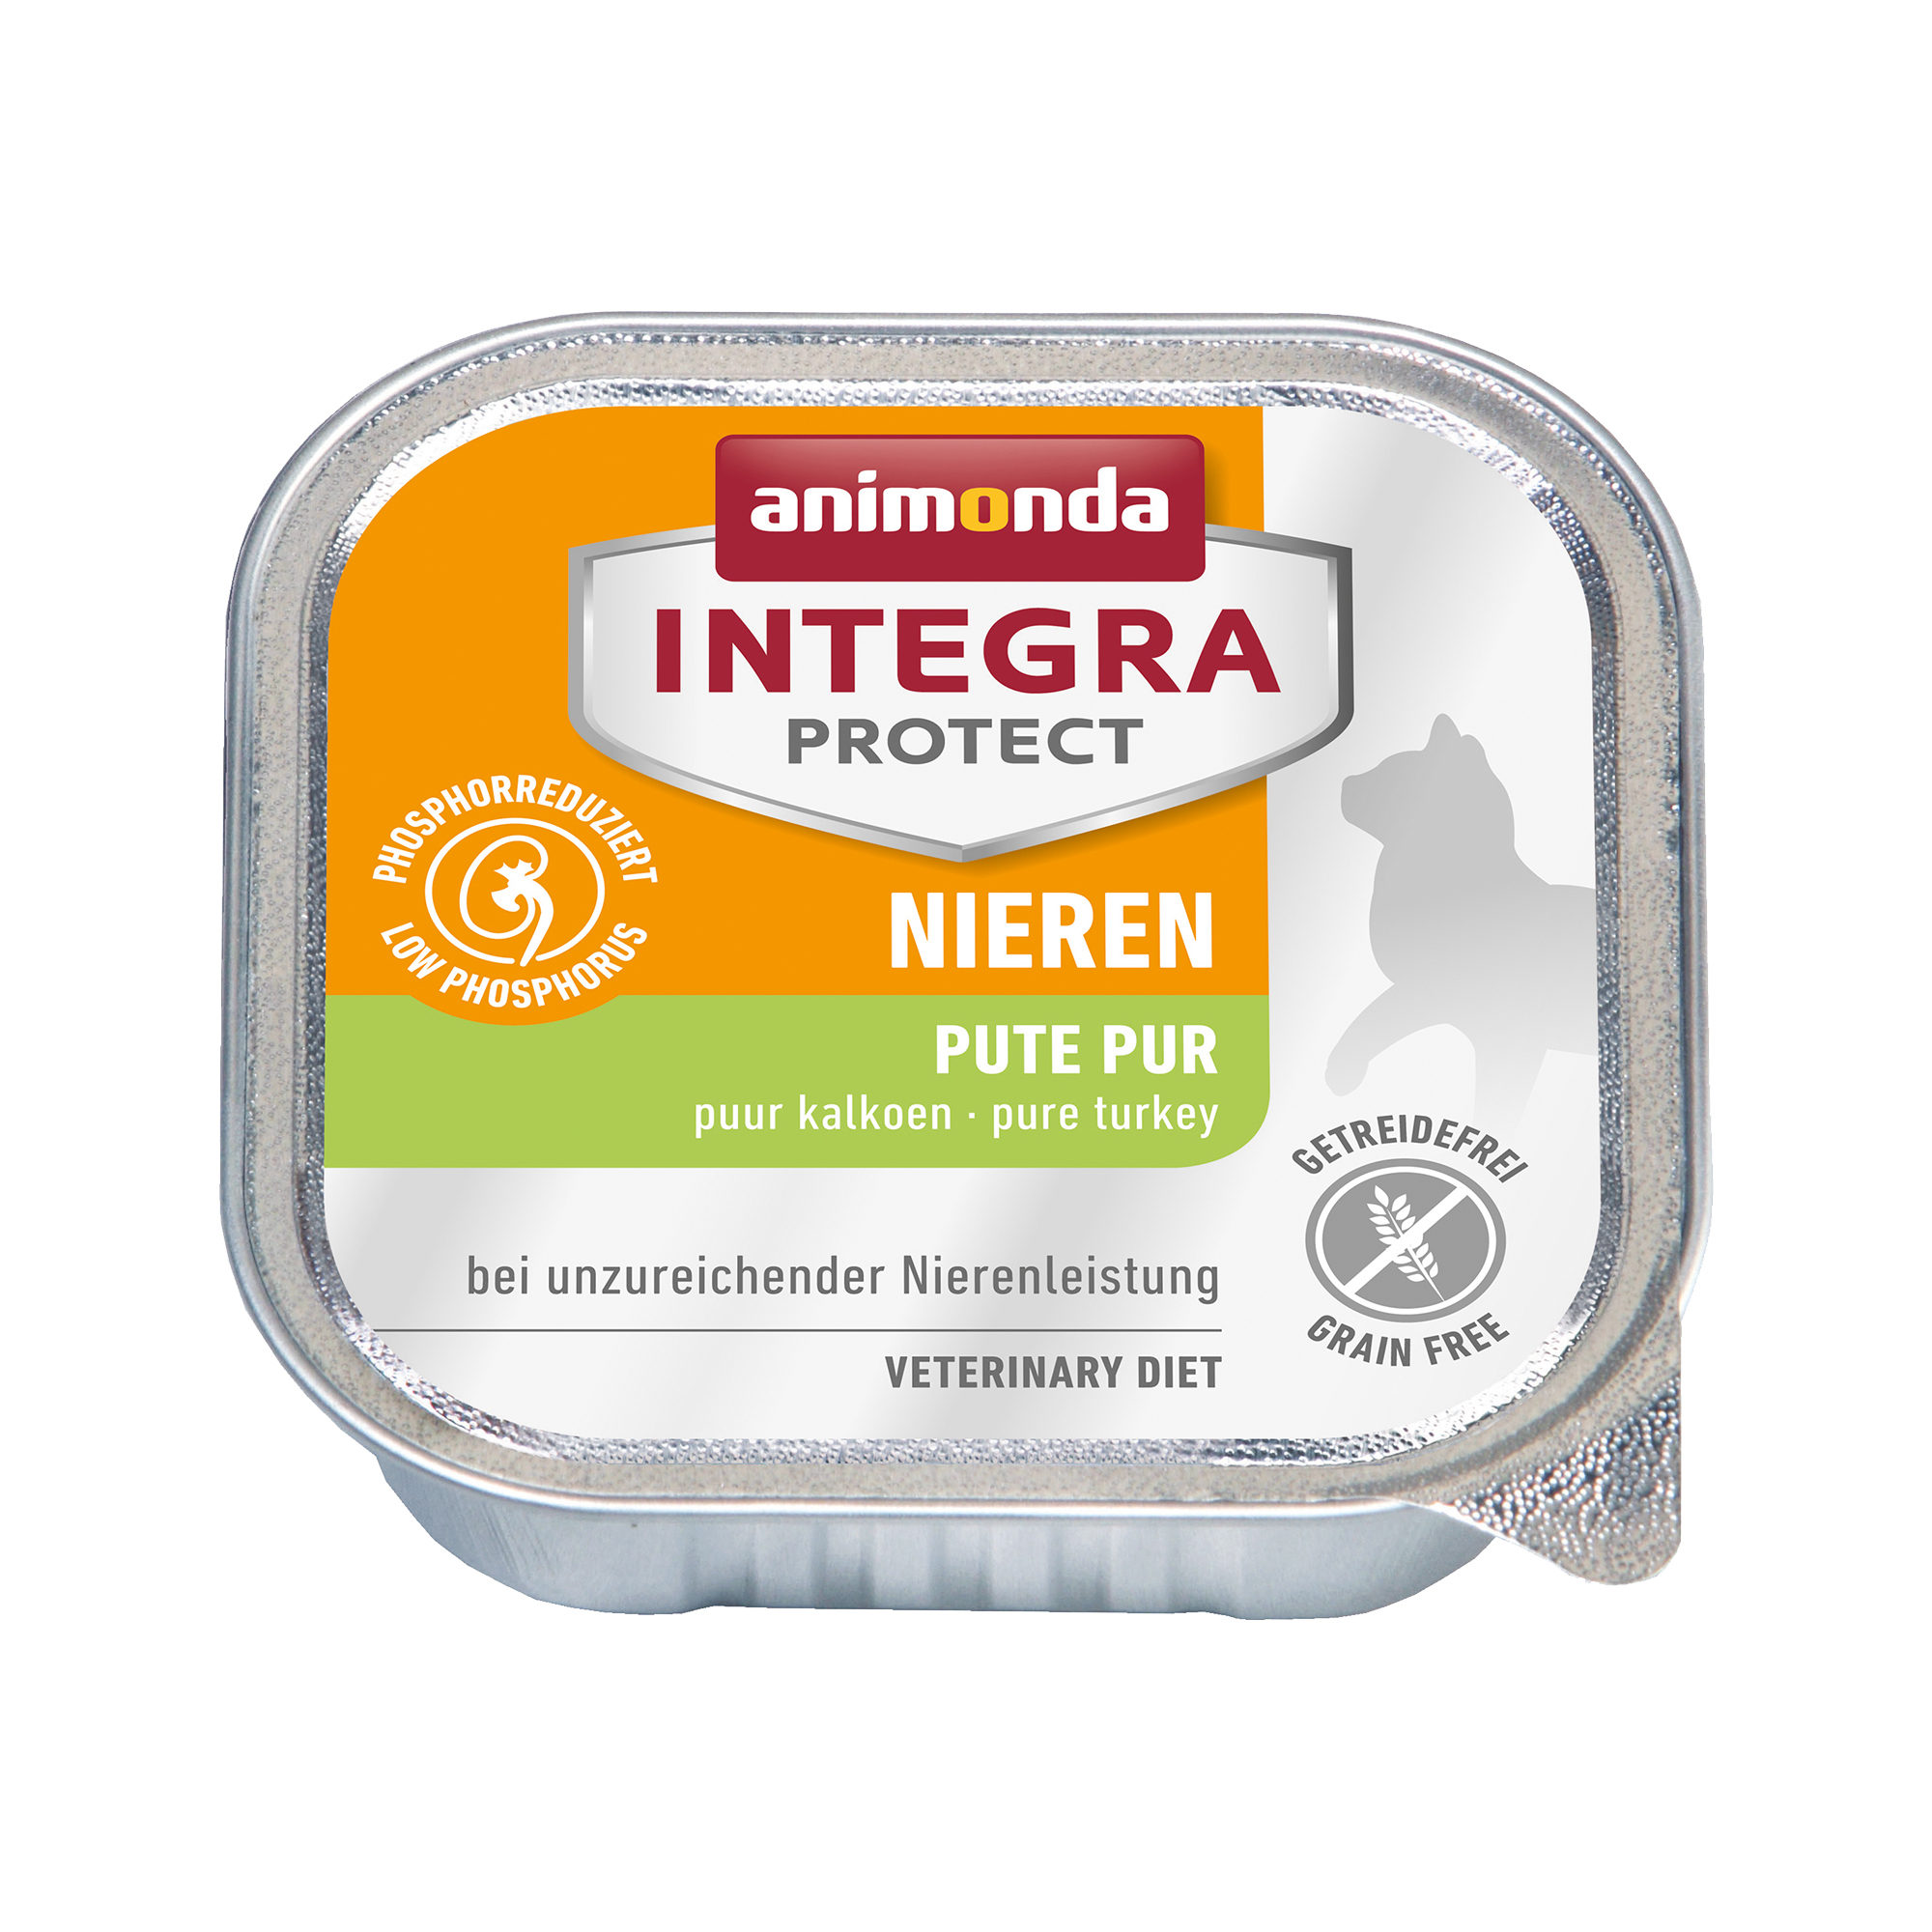 Animonda Integra Protect Nieren Katzenfutter - Schälchen - Pute - 16 x 100 g